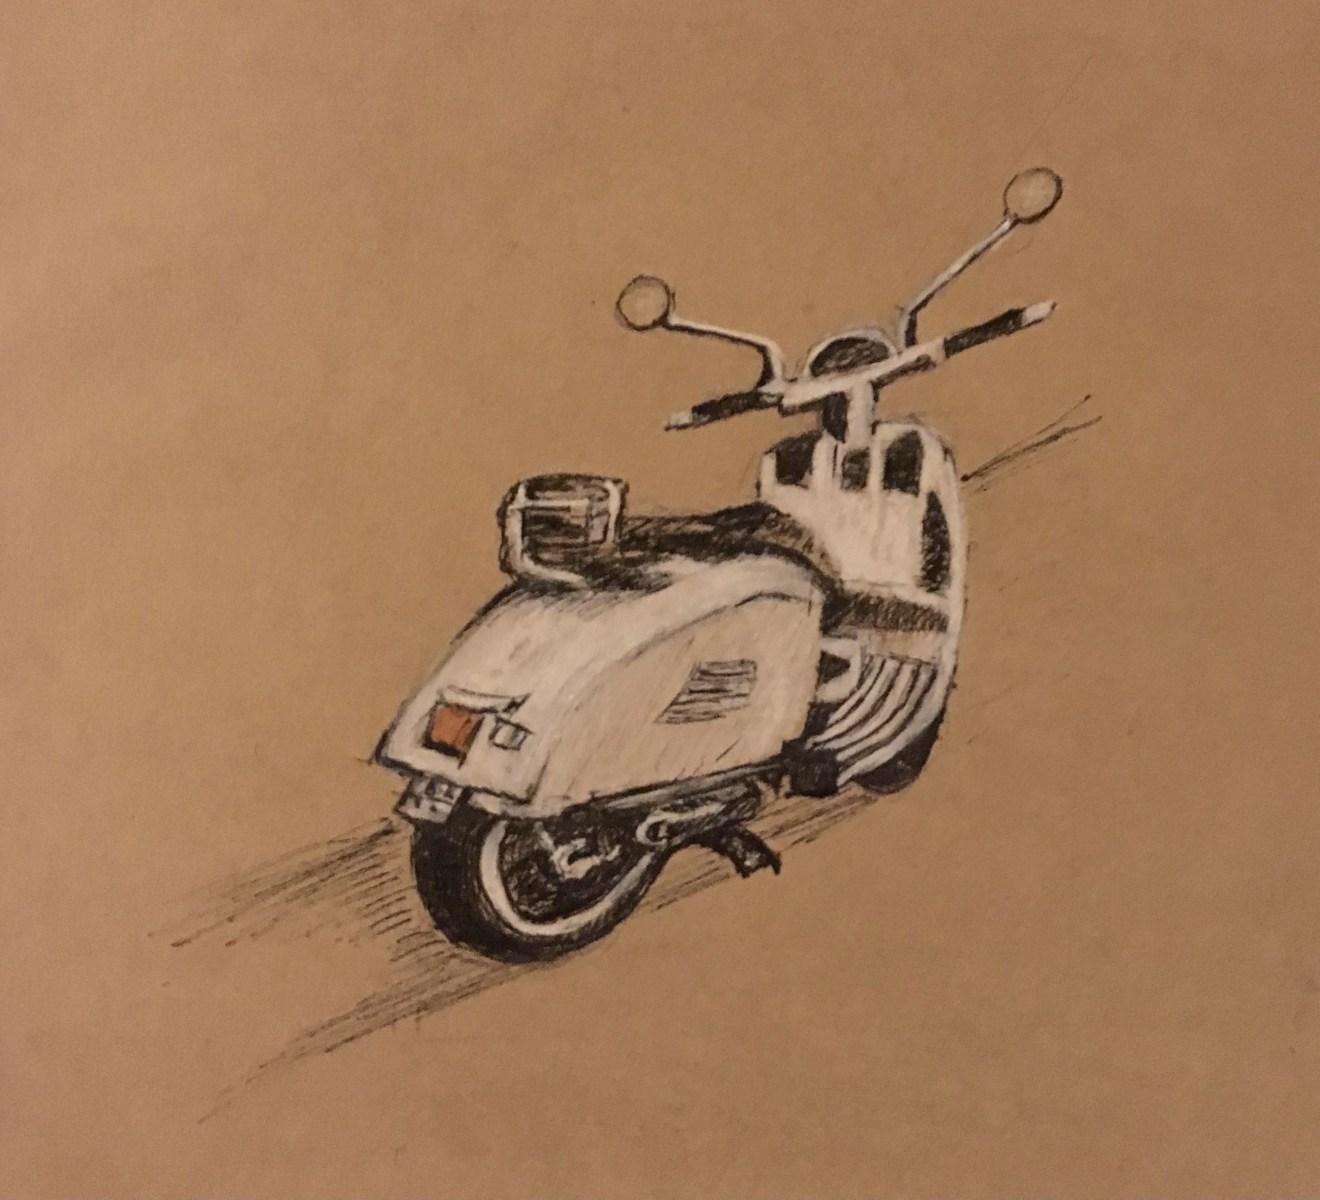 Bike - Nancye Davison